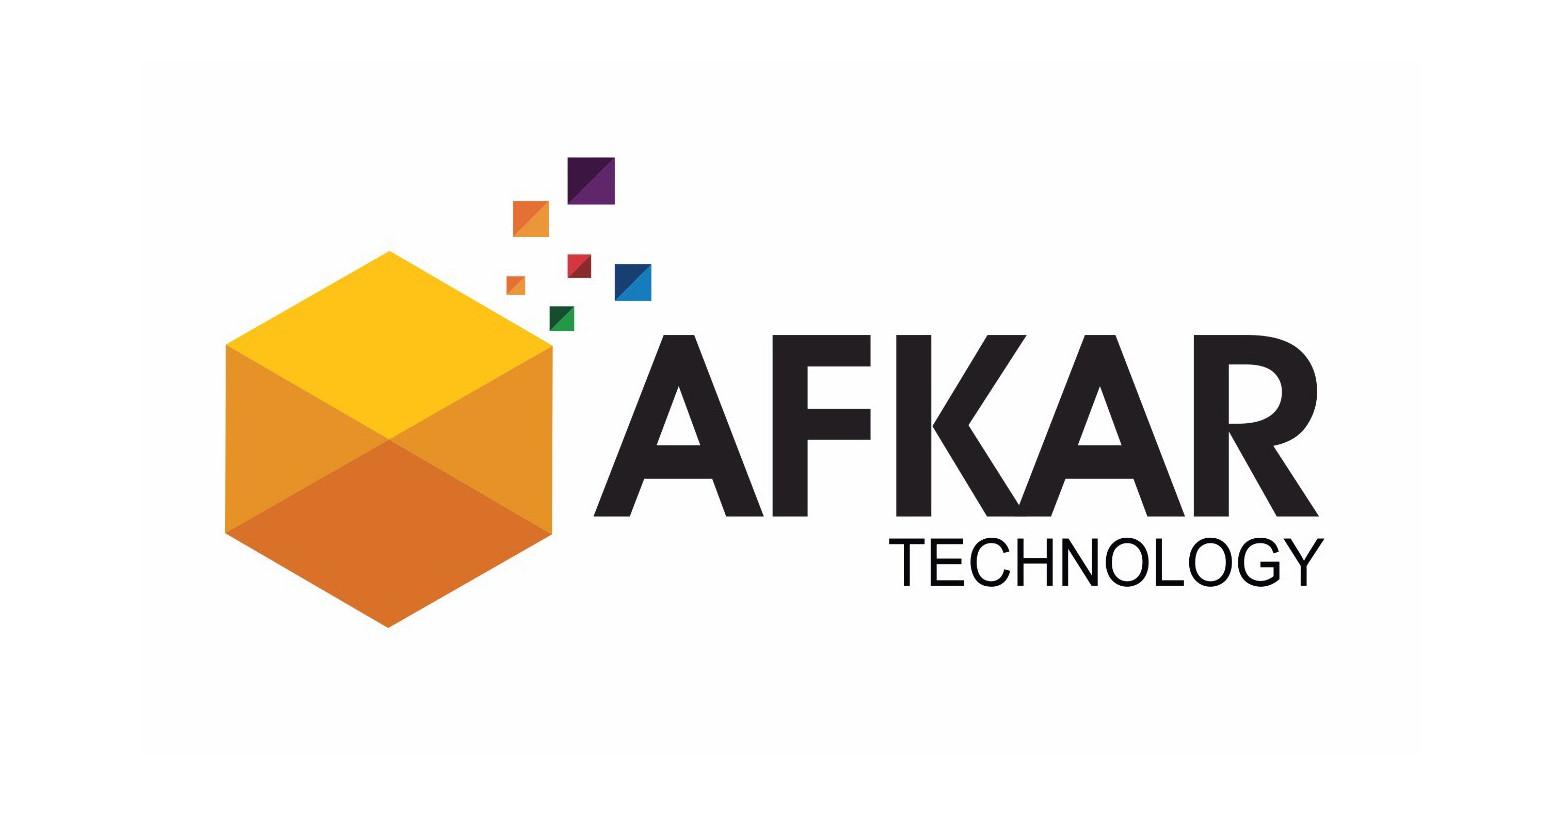 Job: Java Developer at AFKAR Technology in Cairo, Egypt